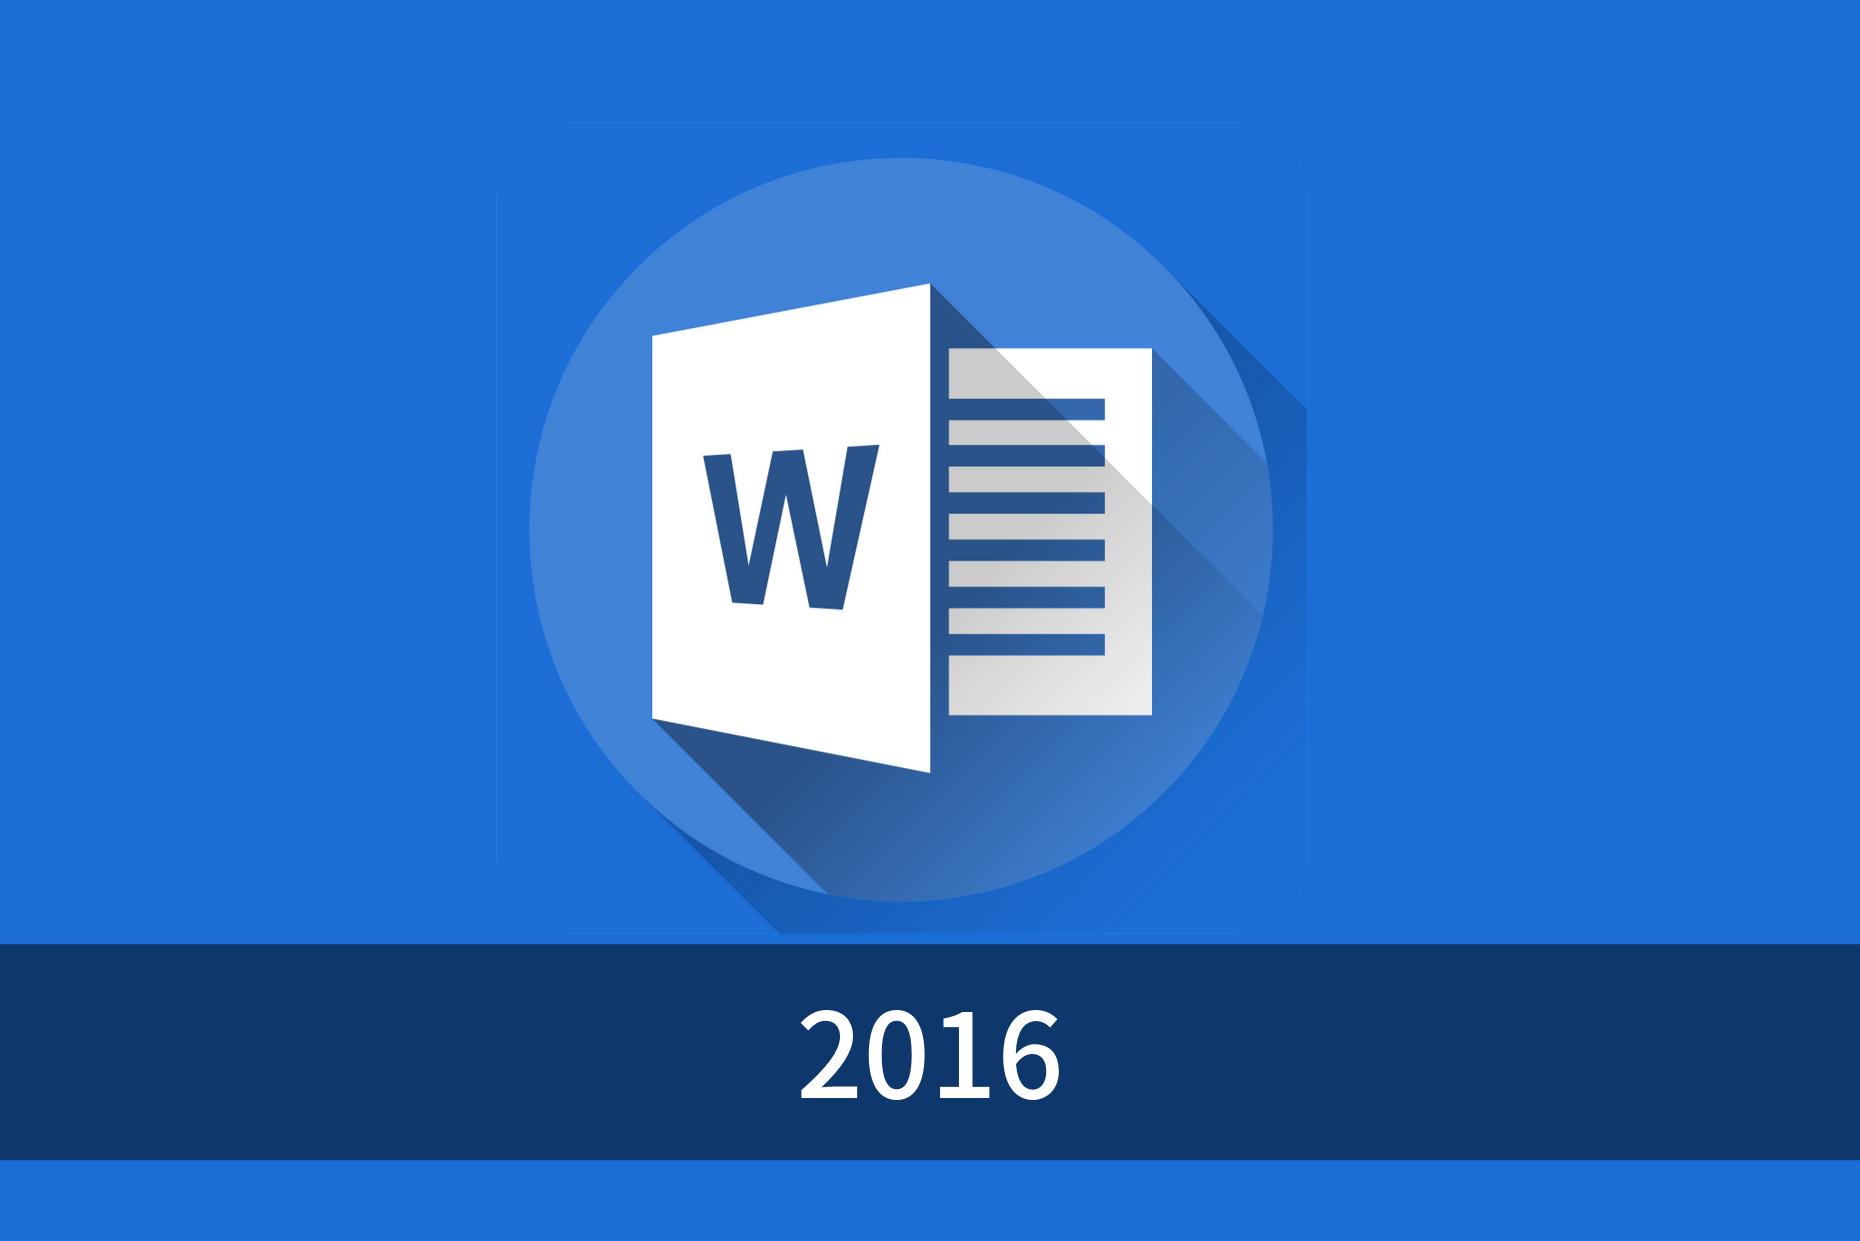 Word 2016 Learning(入門から活用まで)